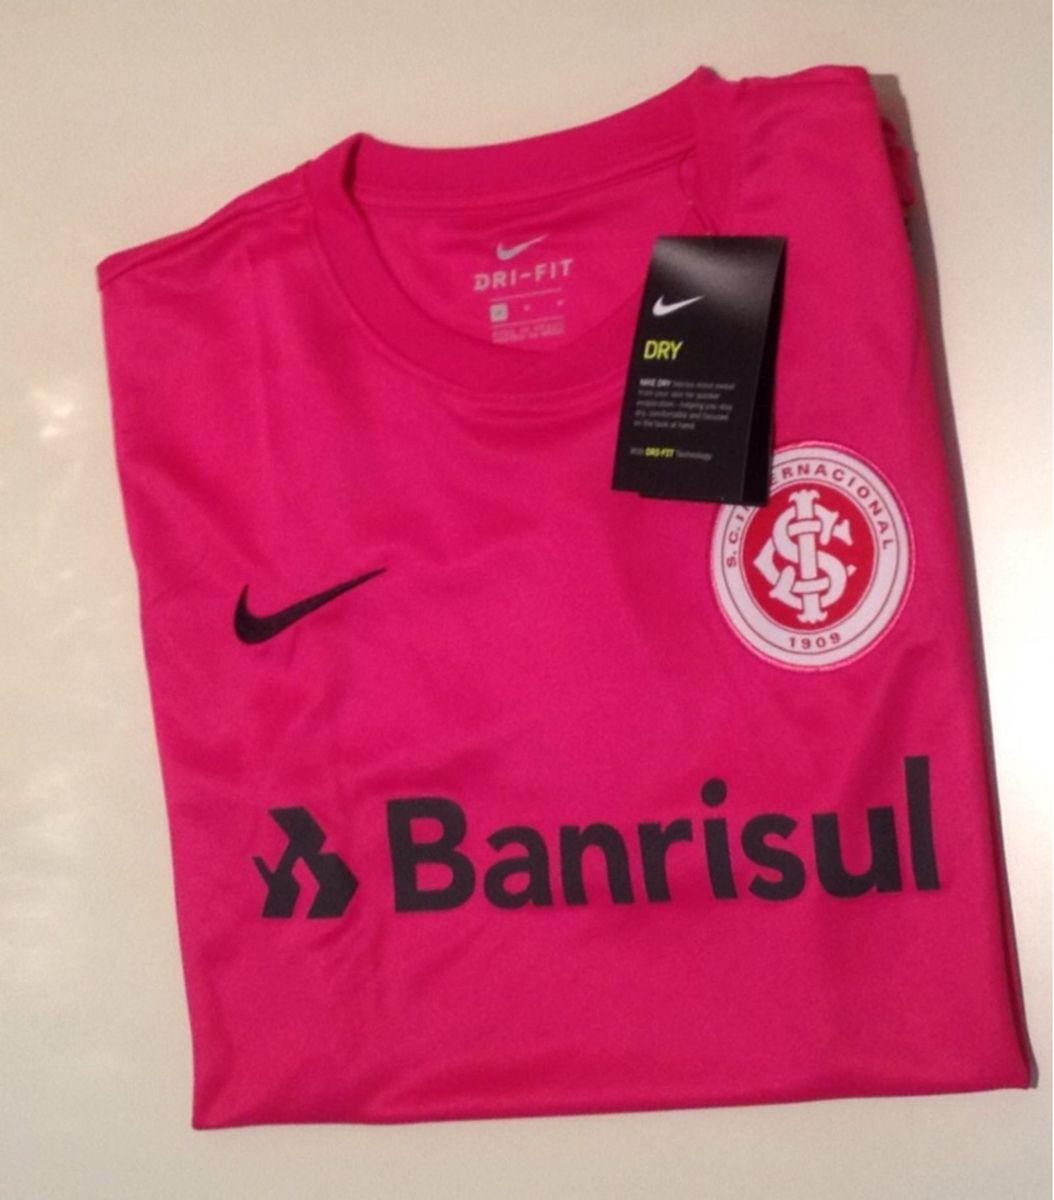 Camiseta Nike Dryfit Rosa Internacional Roupa Esportiva Masculino Nike Nunca Usado 26511062 Enjoei